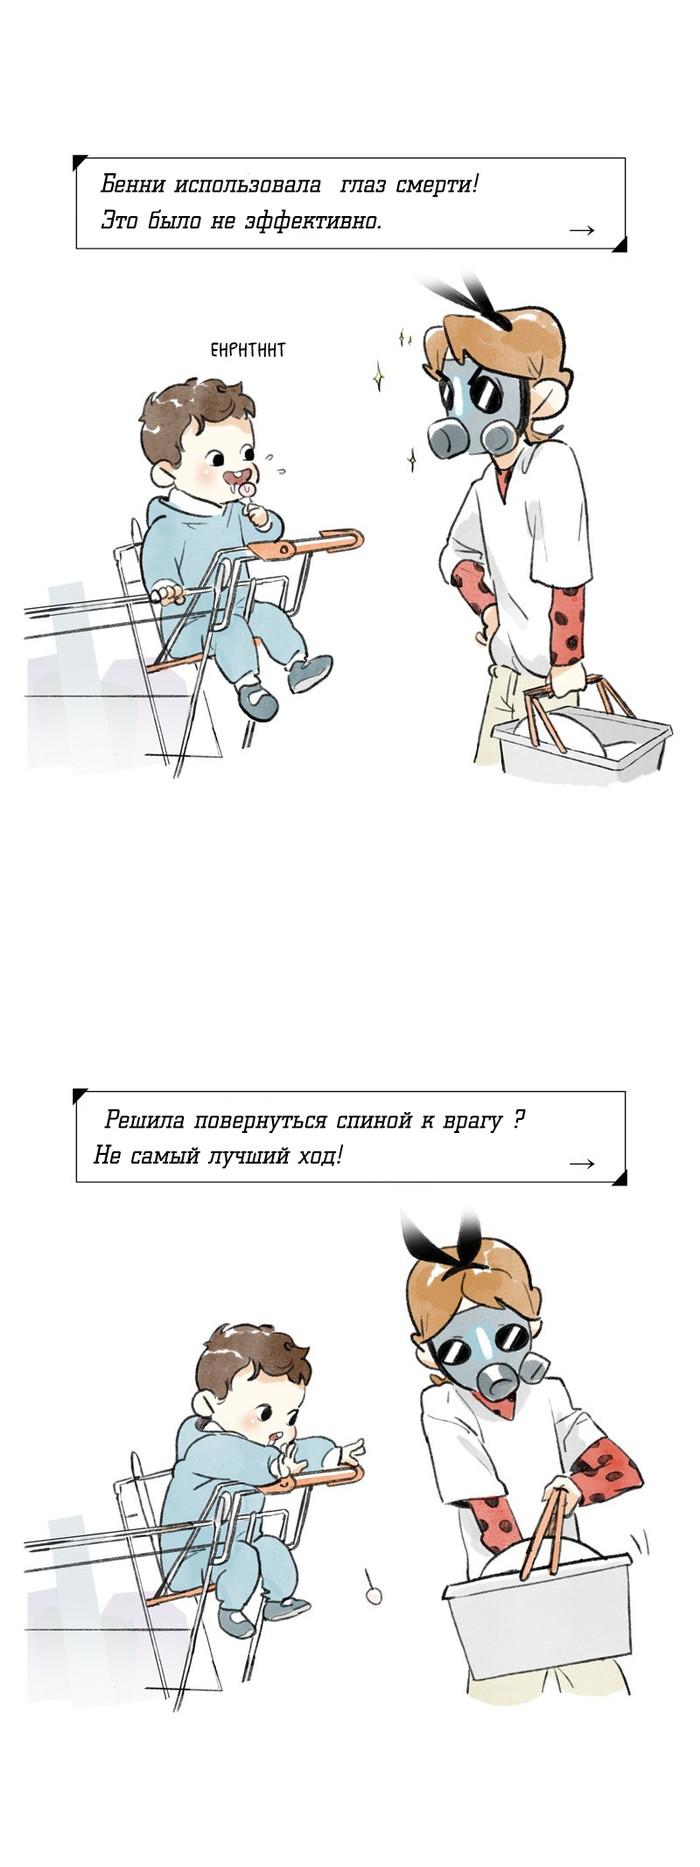 My name is Benny (Ep.42) Sokomin, Mnib, Перевел сам, Комиксы, Длиннопост